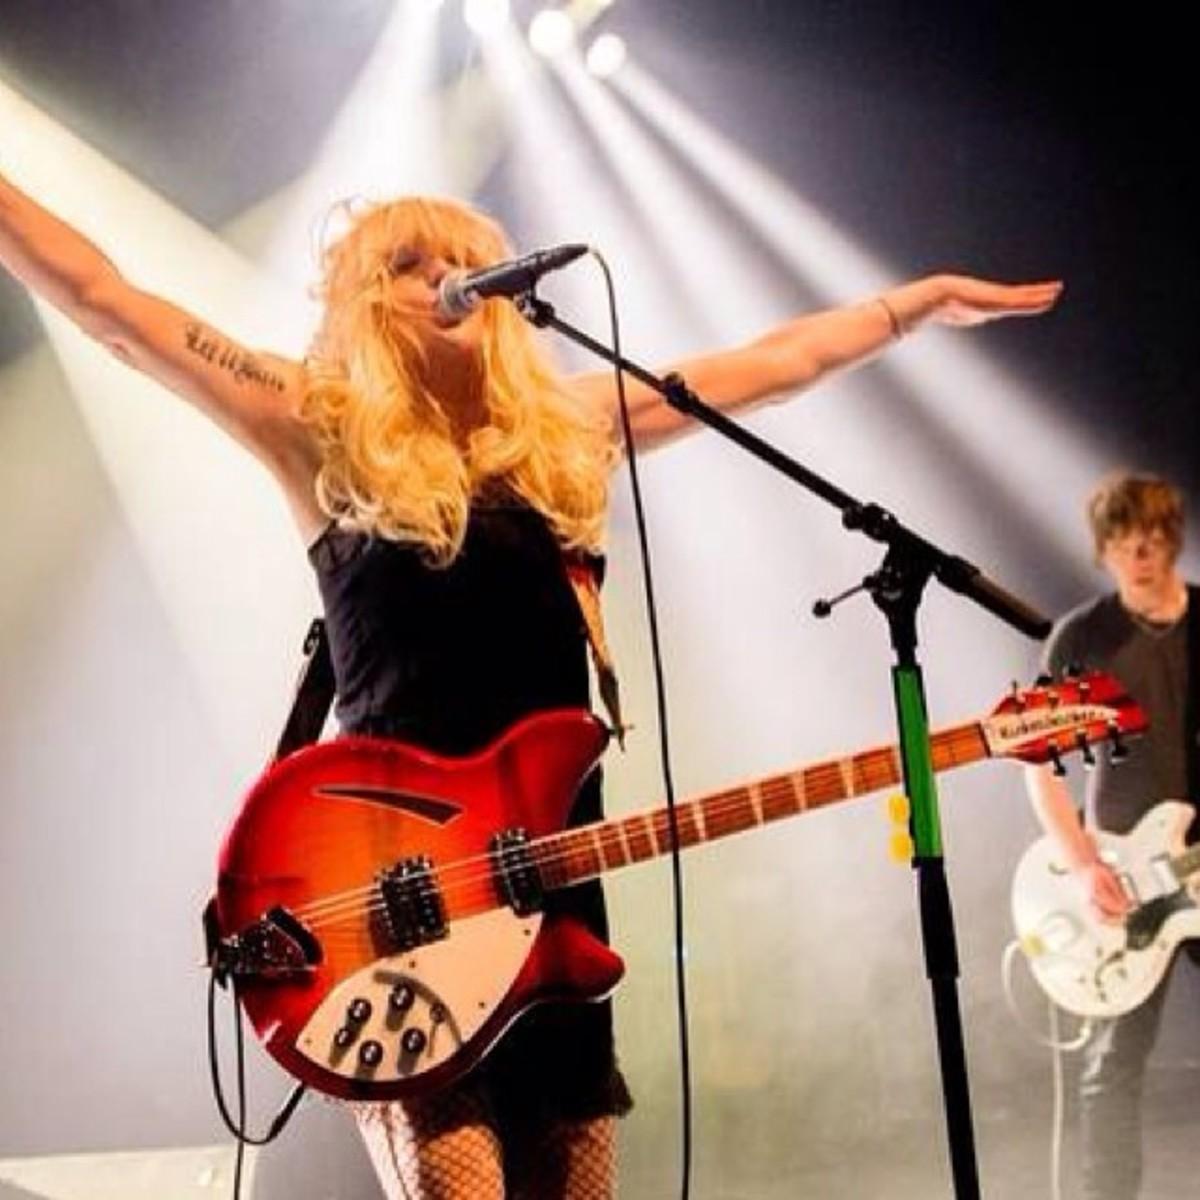 Courtney Love.jpg